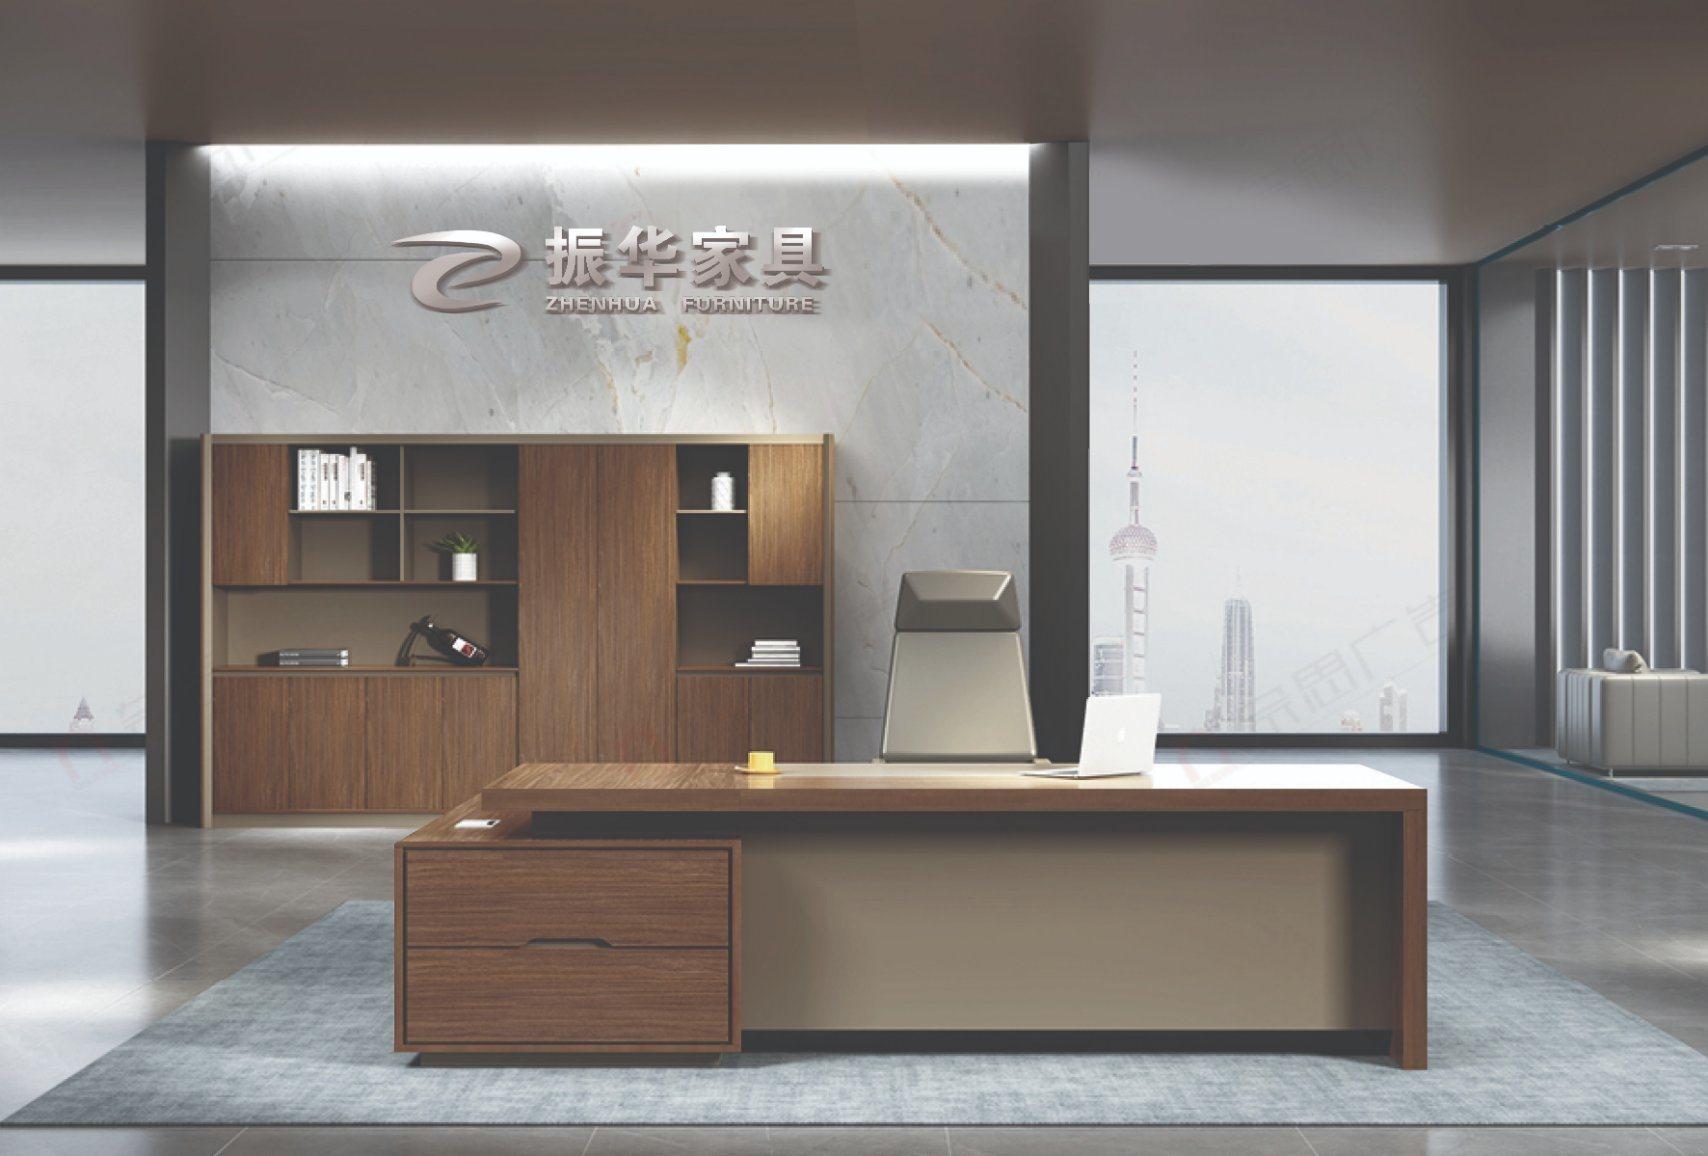 China Escritorio Moderno Luxury Big Boss Table Desk Design Home Executive Office Desk China Office Table Office Furniture